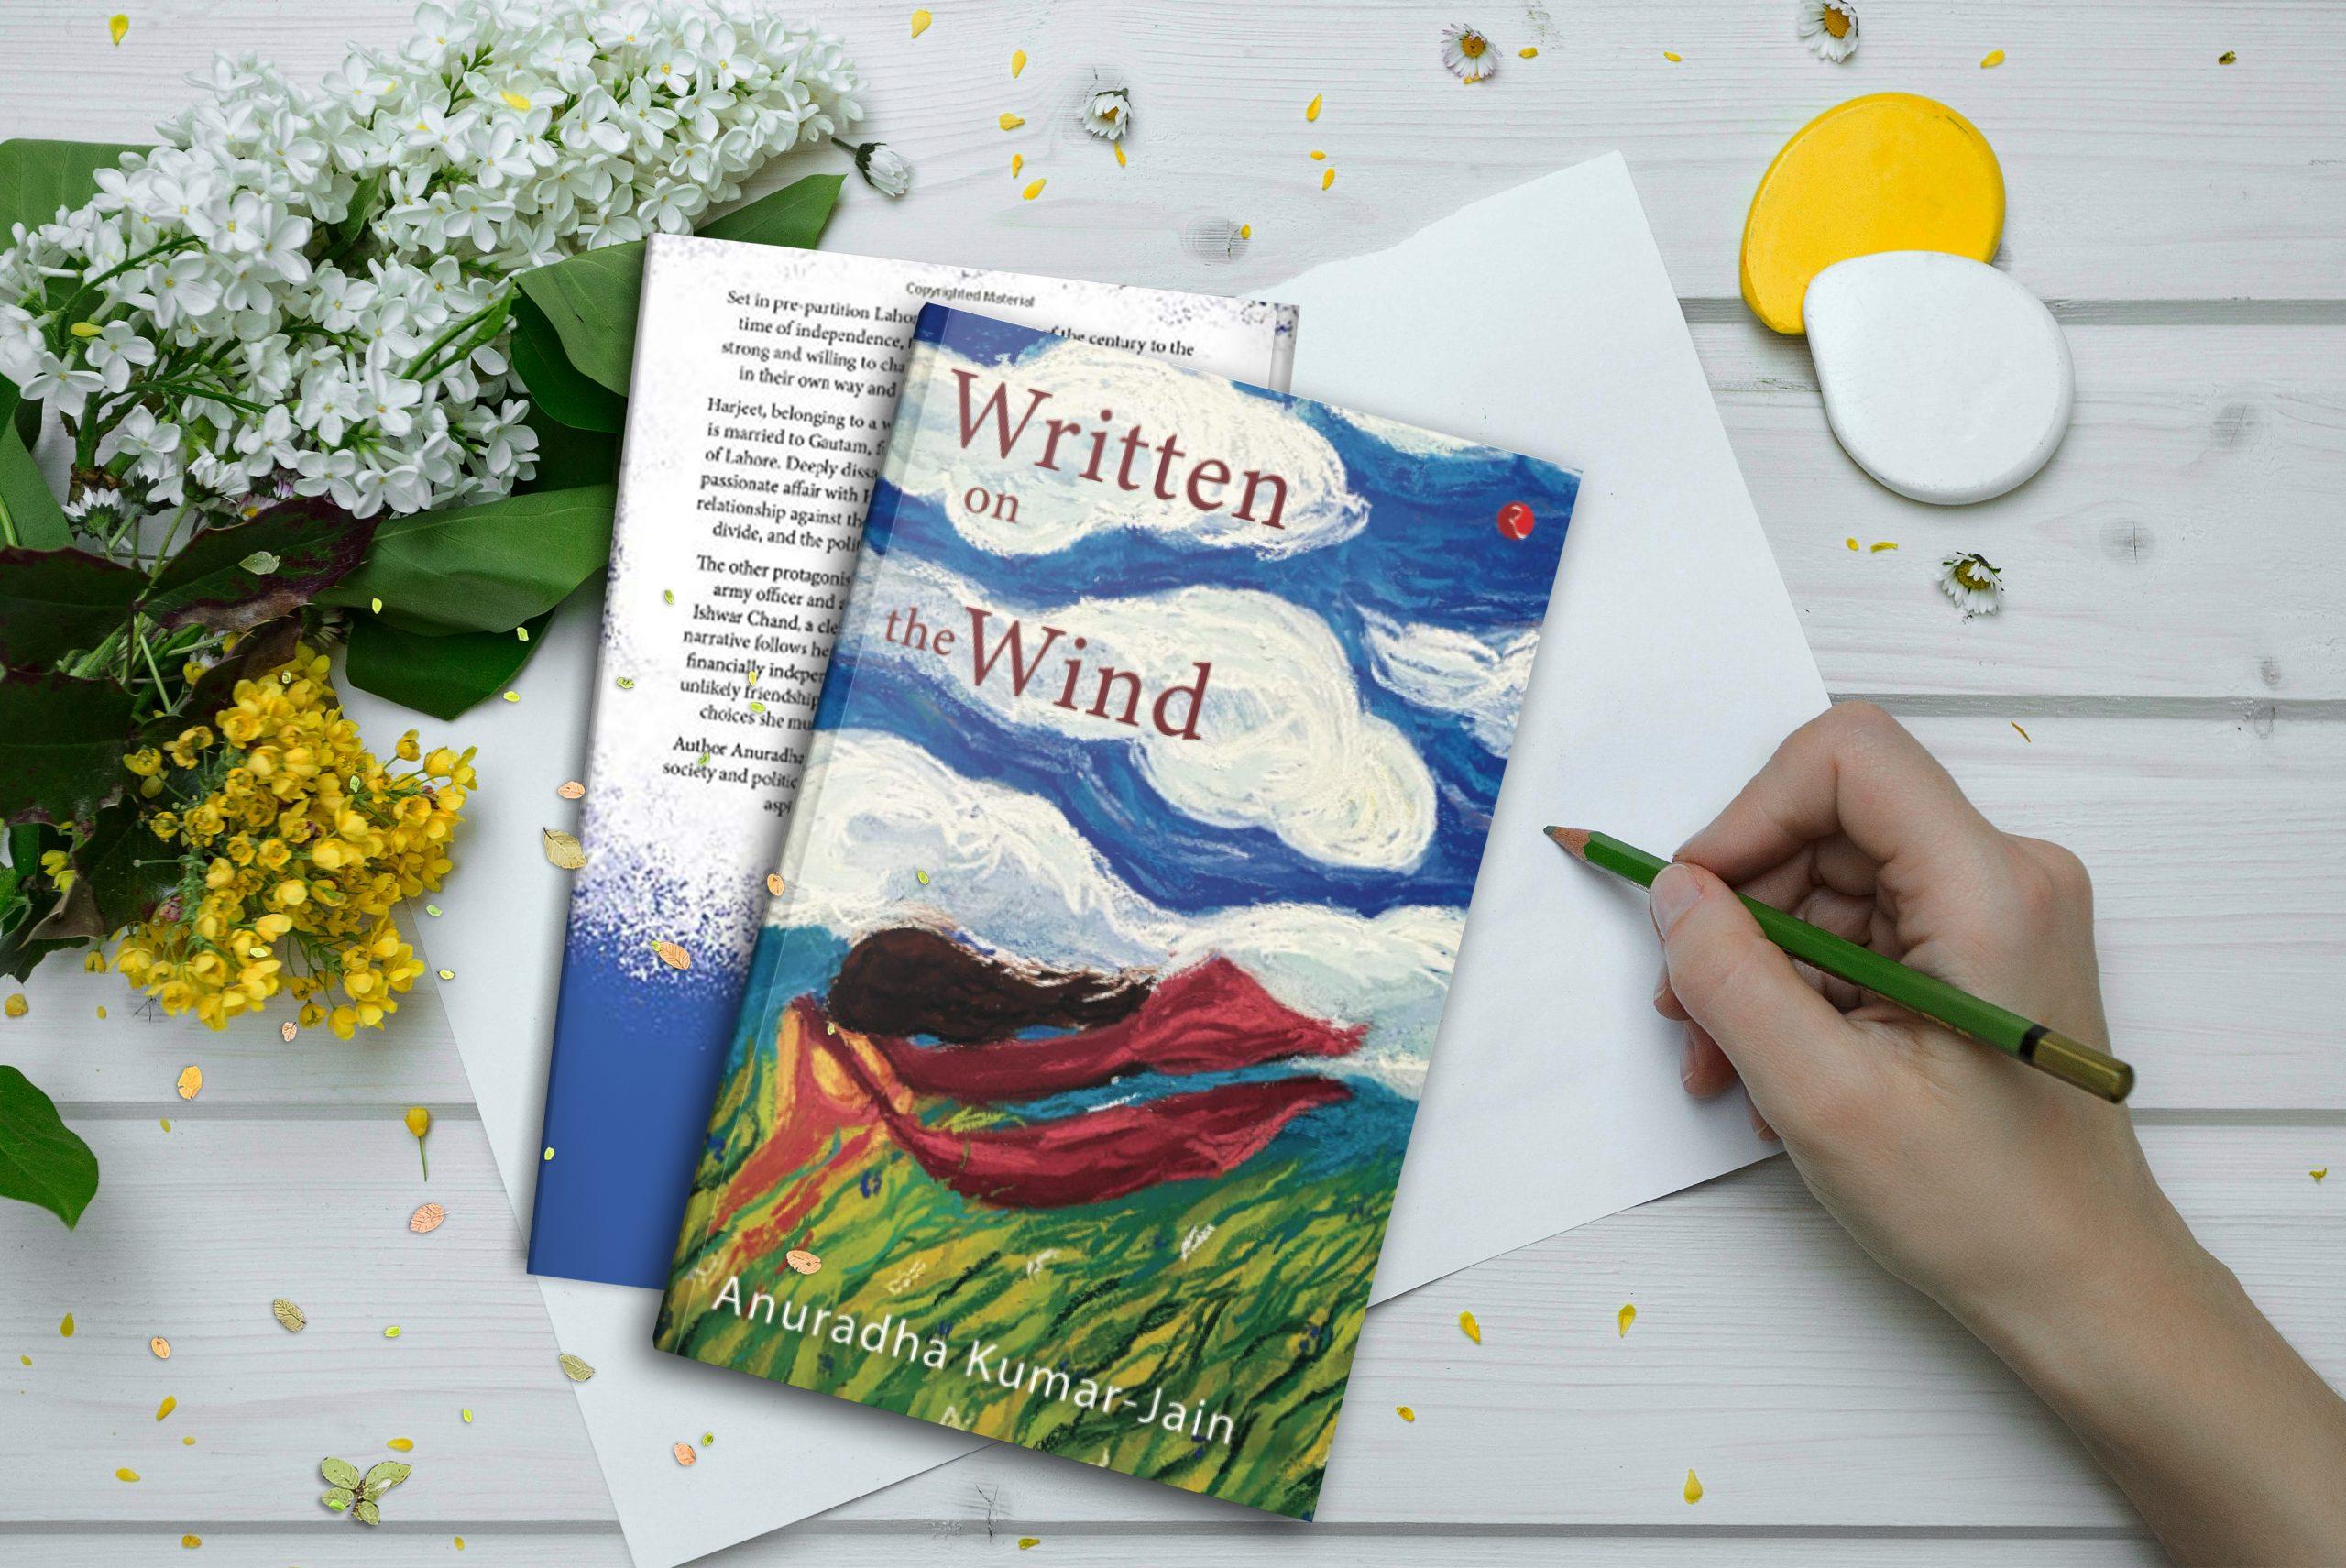 Written On The Wind by Anuradha Kumar-Jain